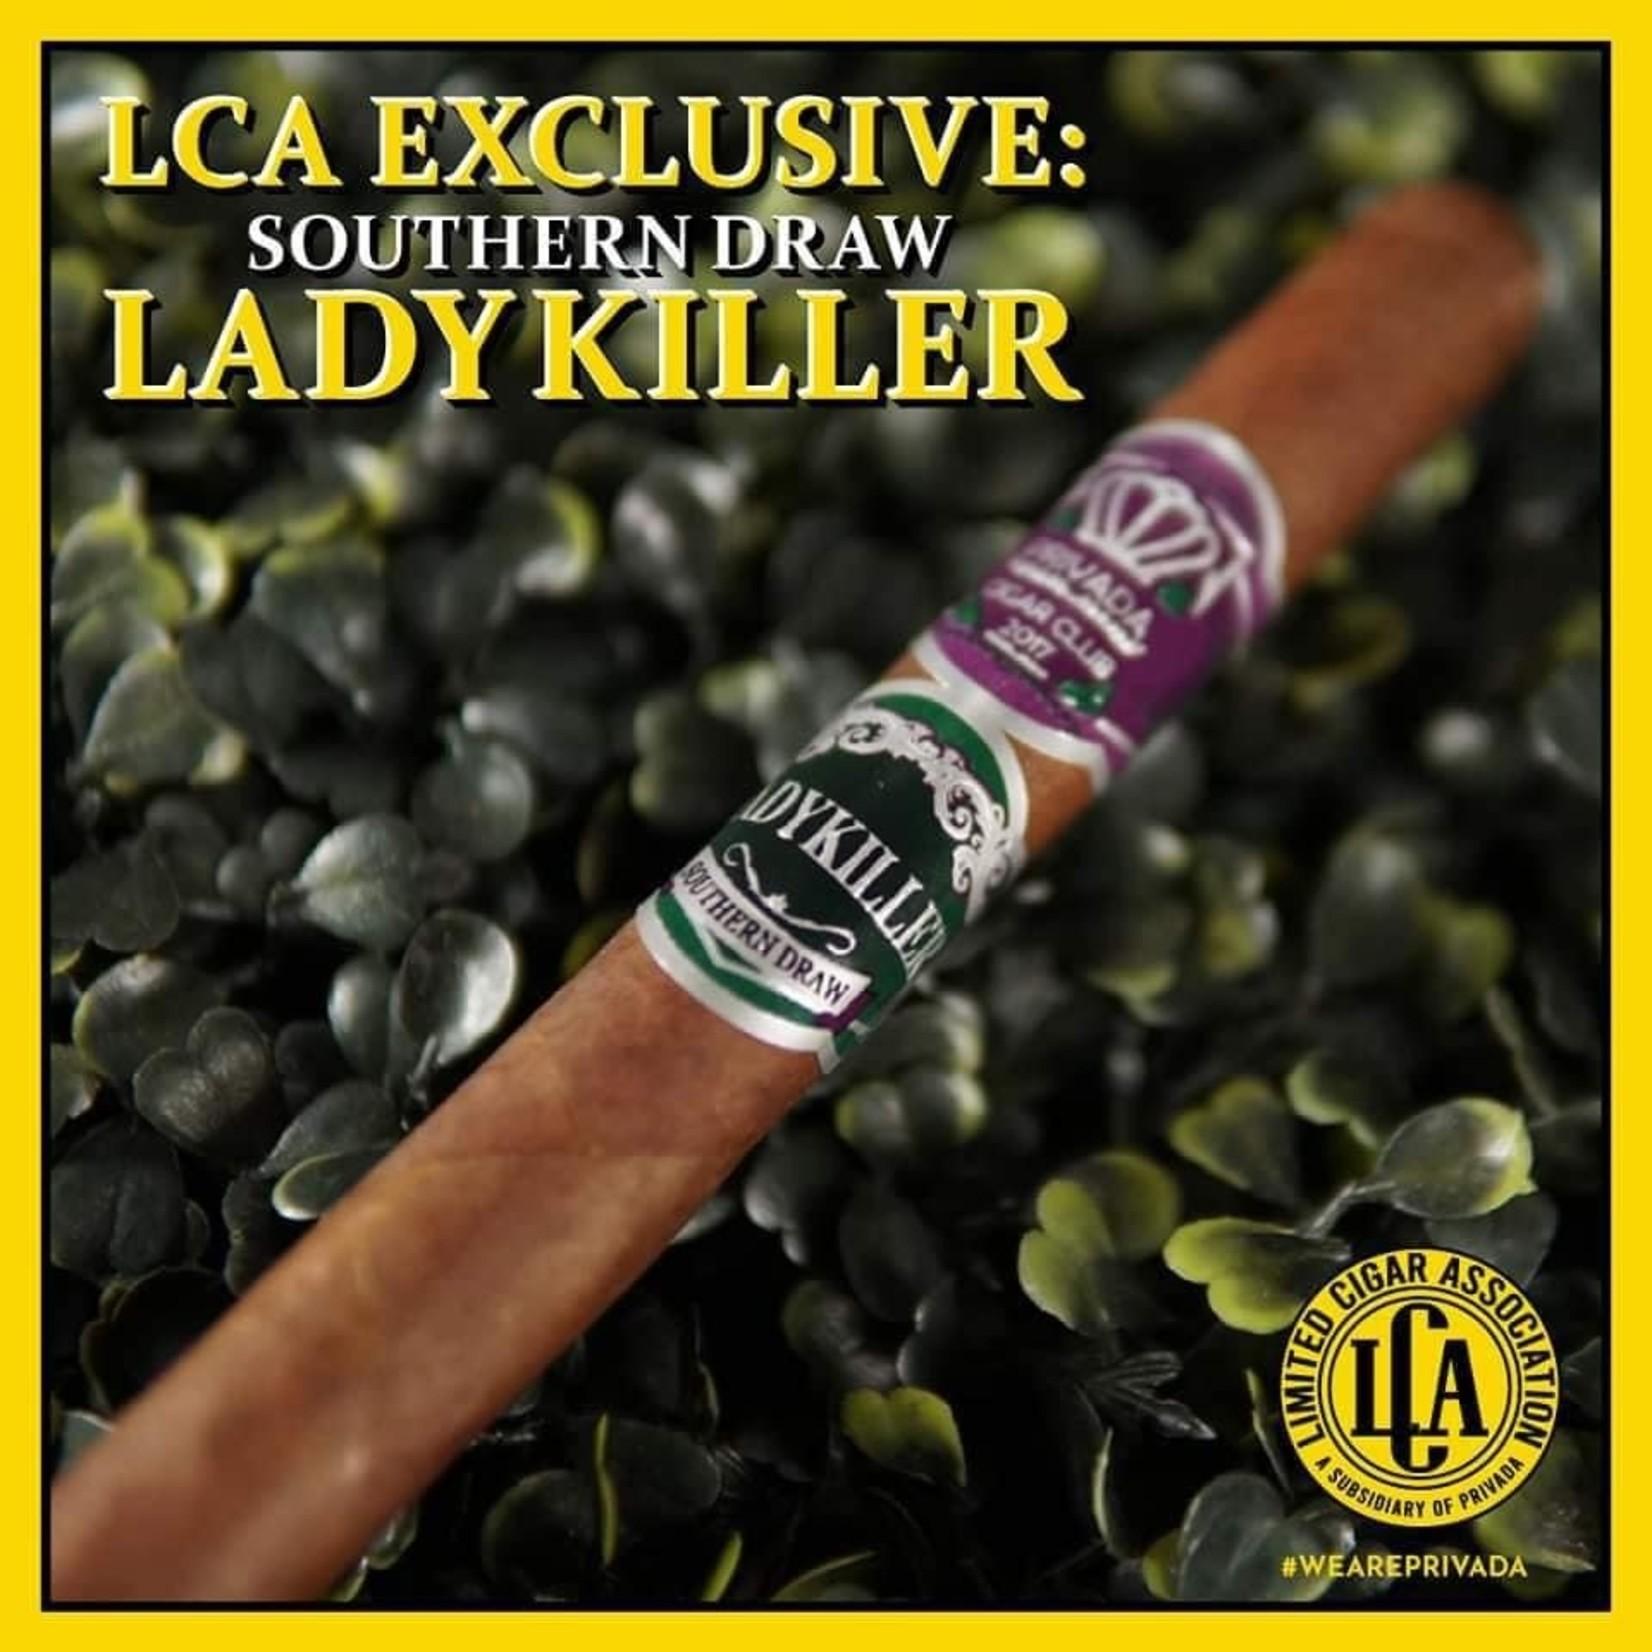 Limited Cigar Association Lady Killer by Southern Draw